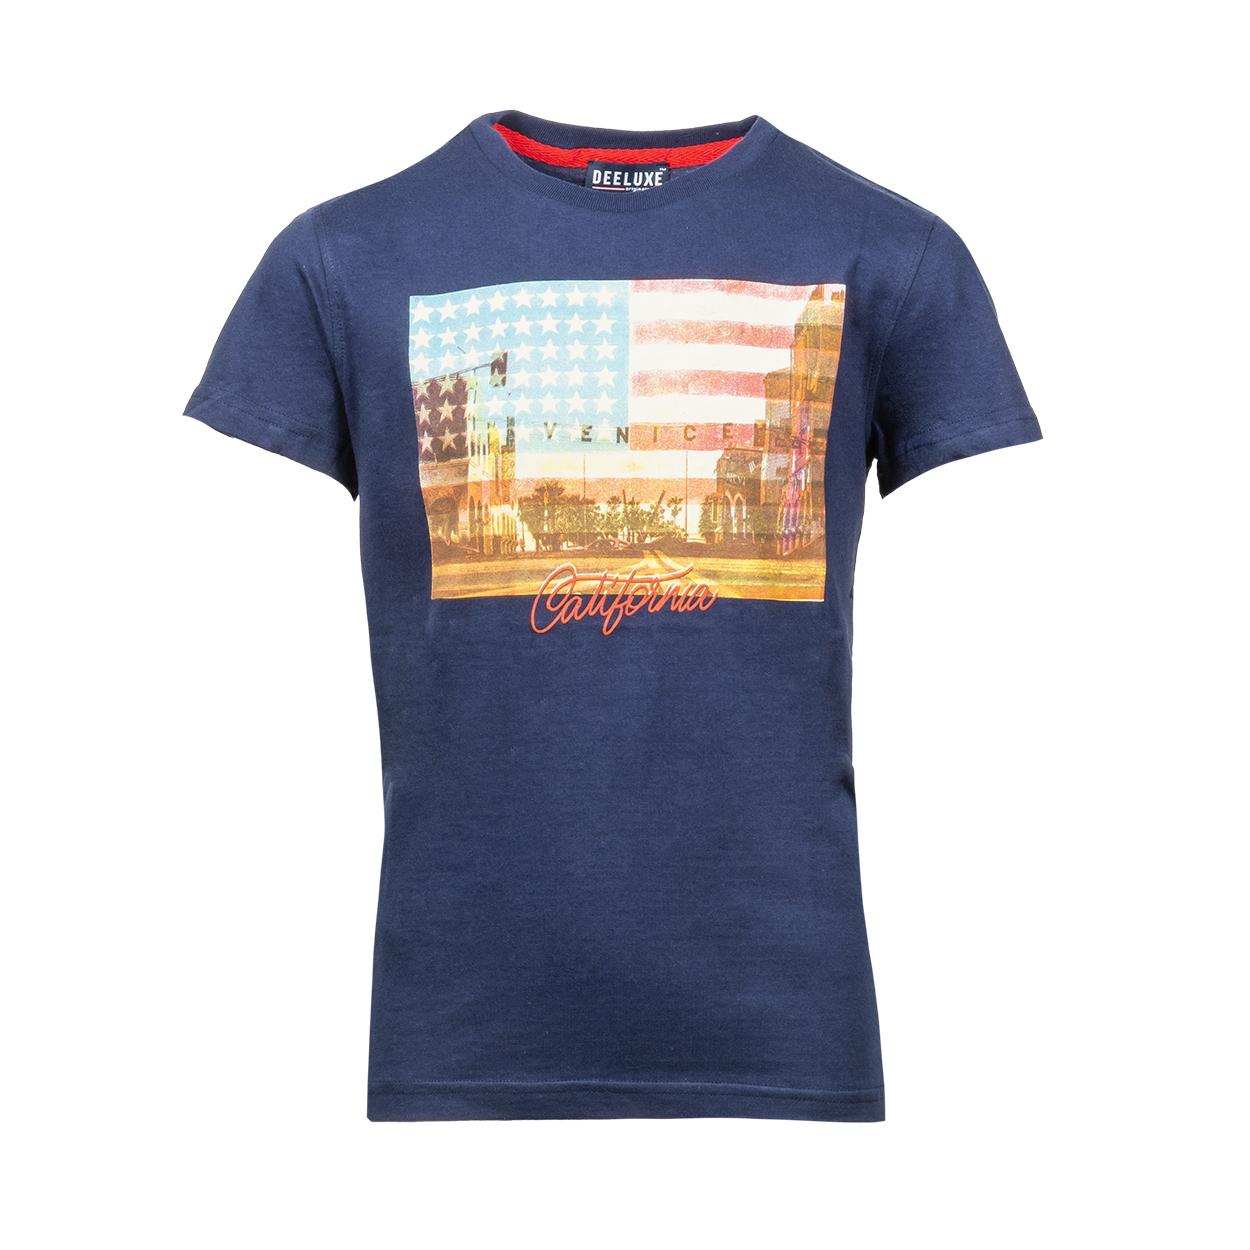 Tee-shirt col rond  cali en coton bleu marine floqué